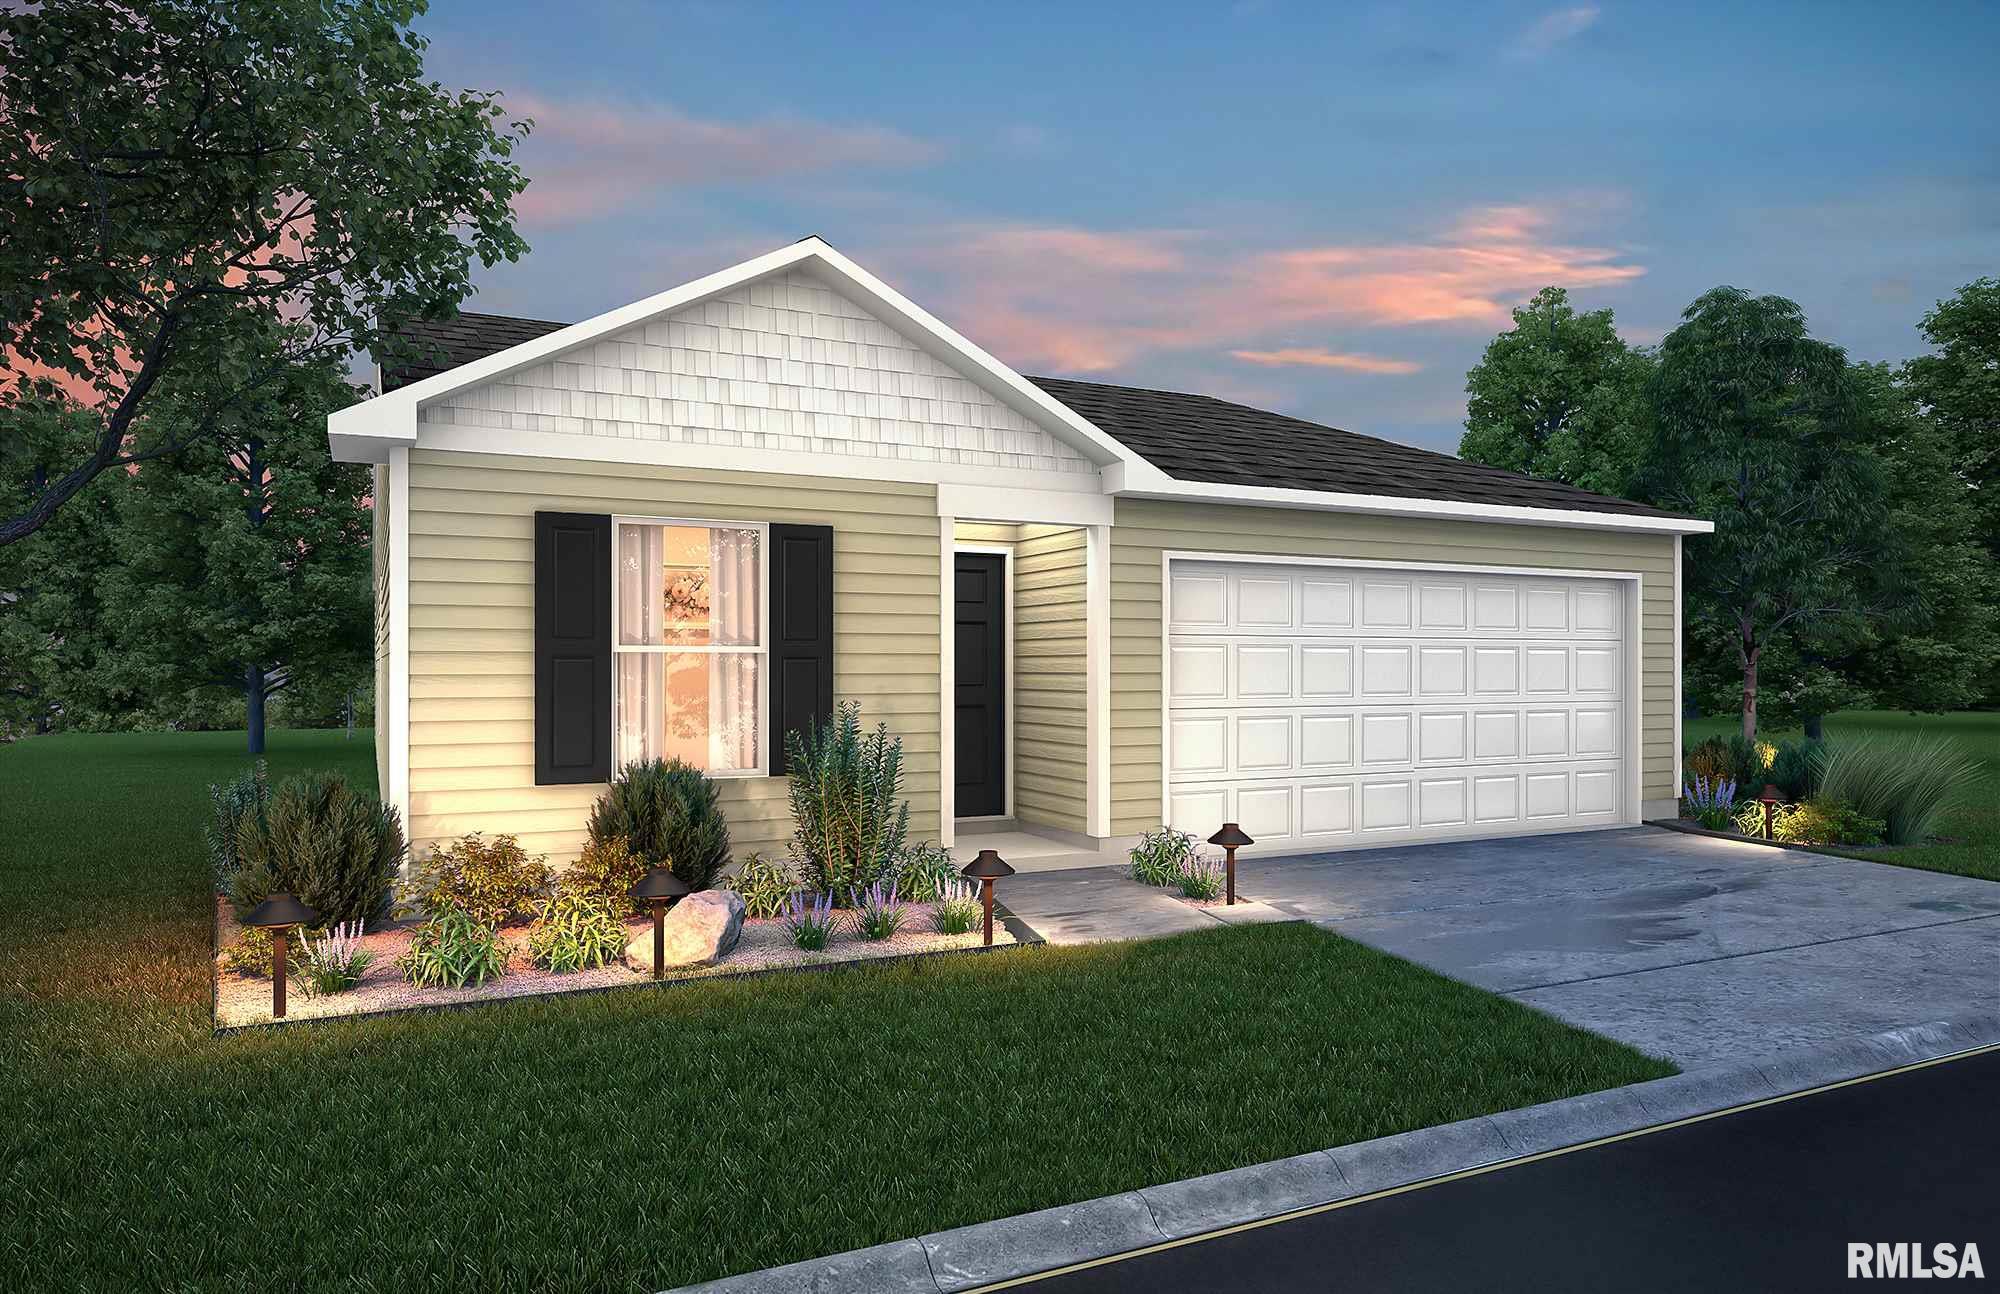 1402 4TH Property Photo - De Witt, IA real estate listing